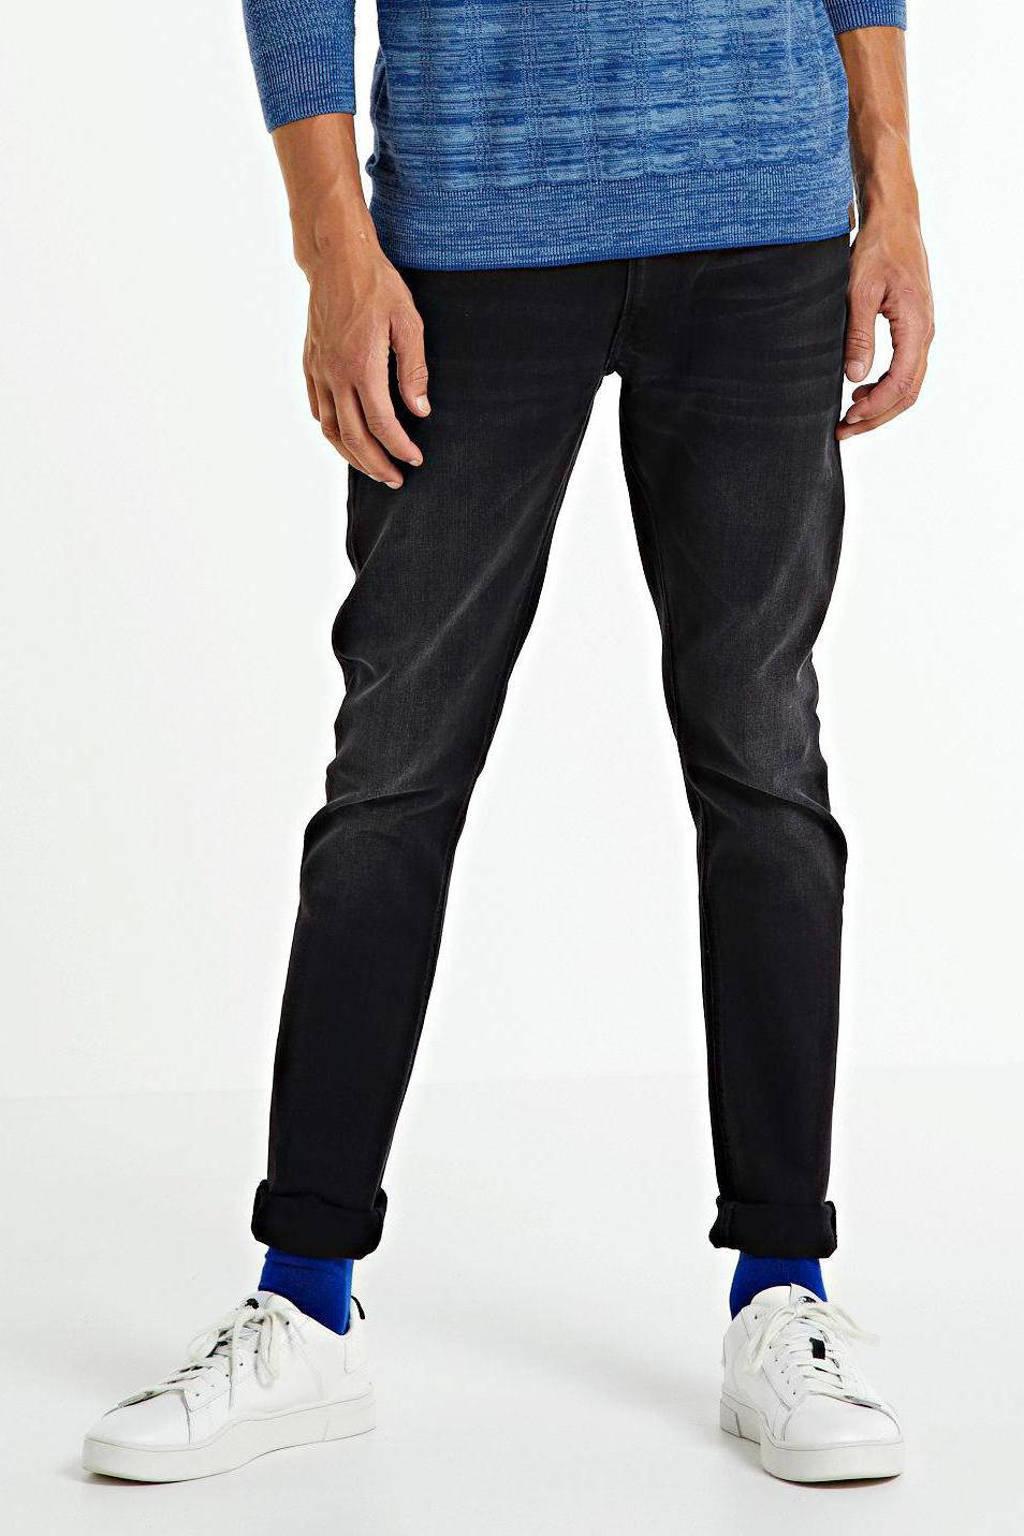 Lee slim fit jeans Luke izhl moto black, IZHL MOTO BLACK